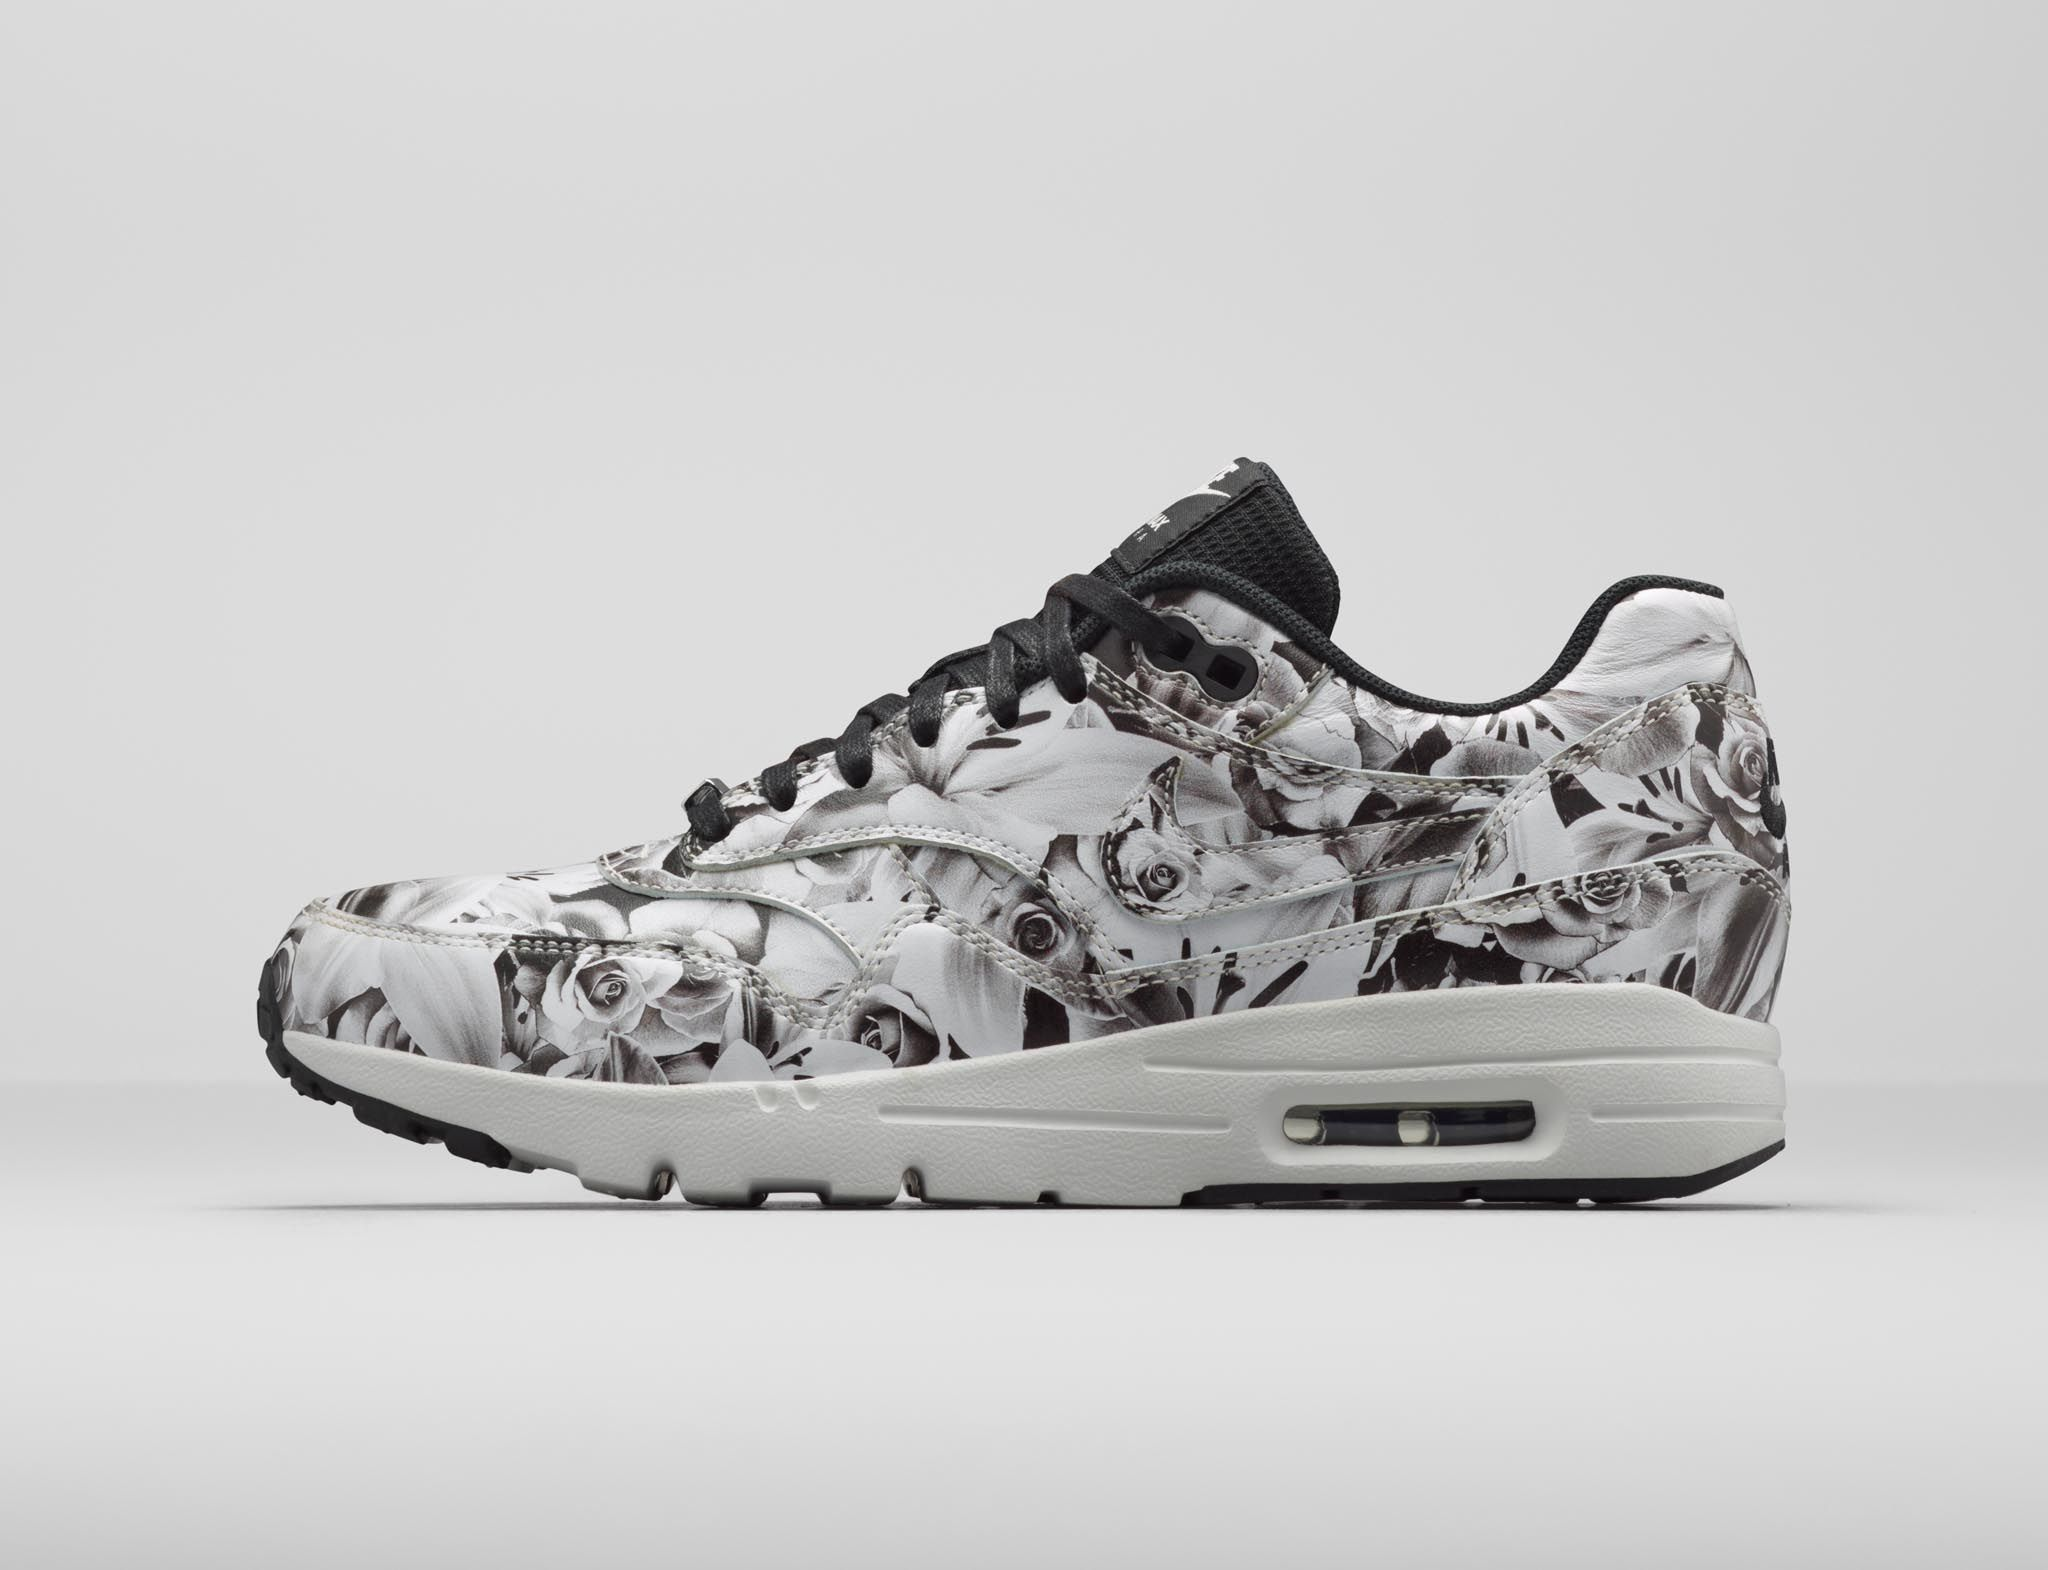 Nike Air Max 1 Hyperfuse Flores Blancas Y Negras